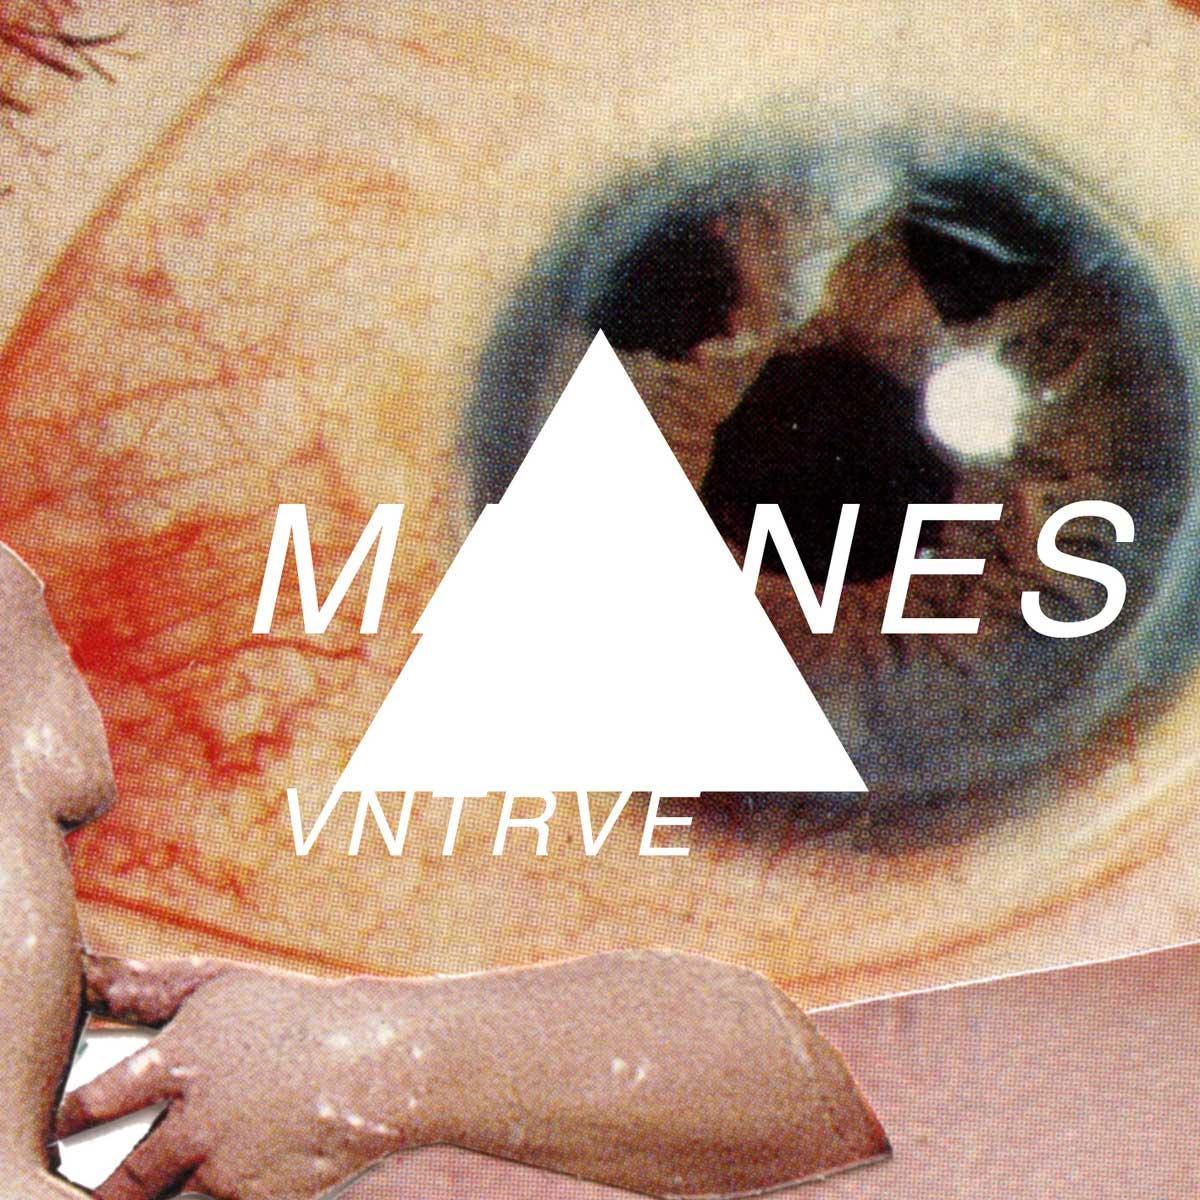 Manes - VNTRVE (single cover)